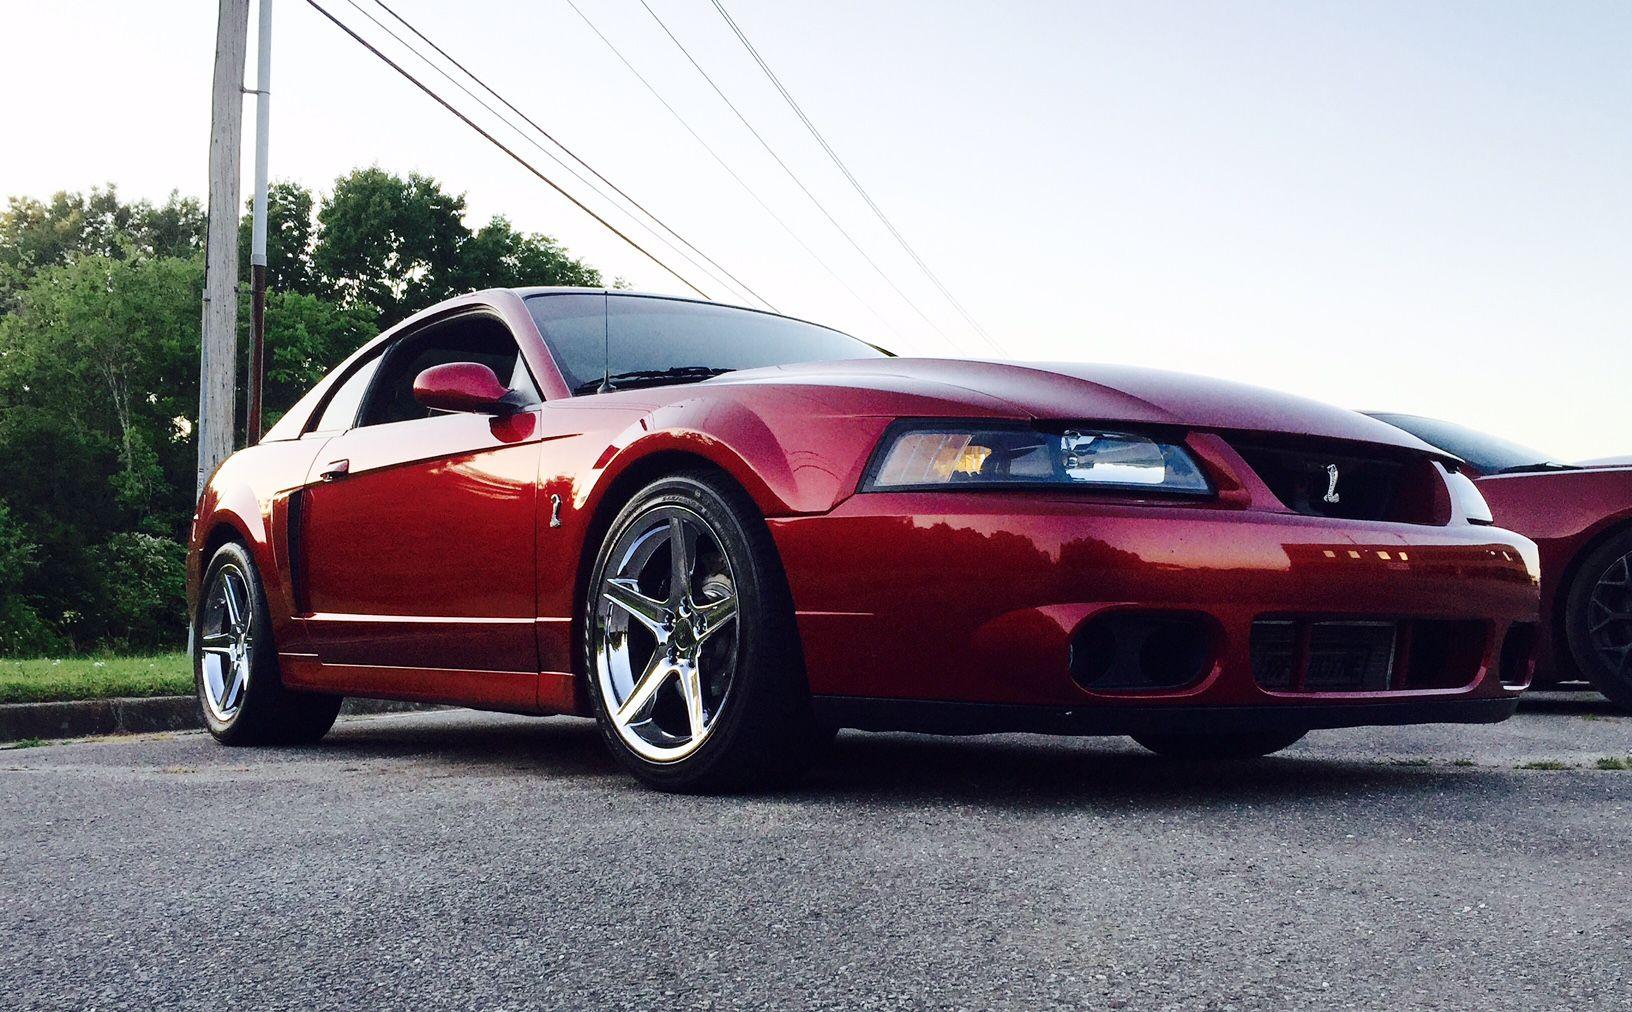 The Terminator Mustang